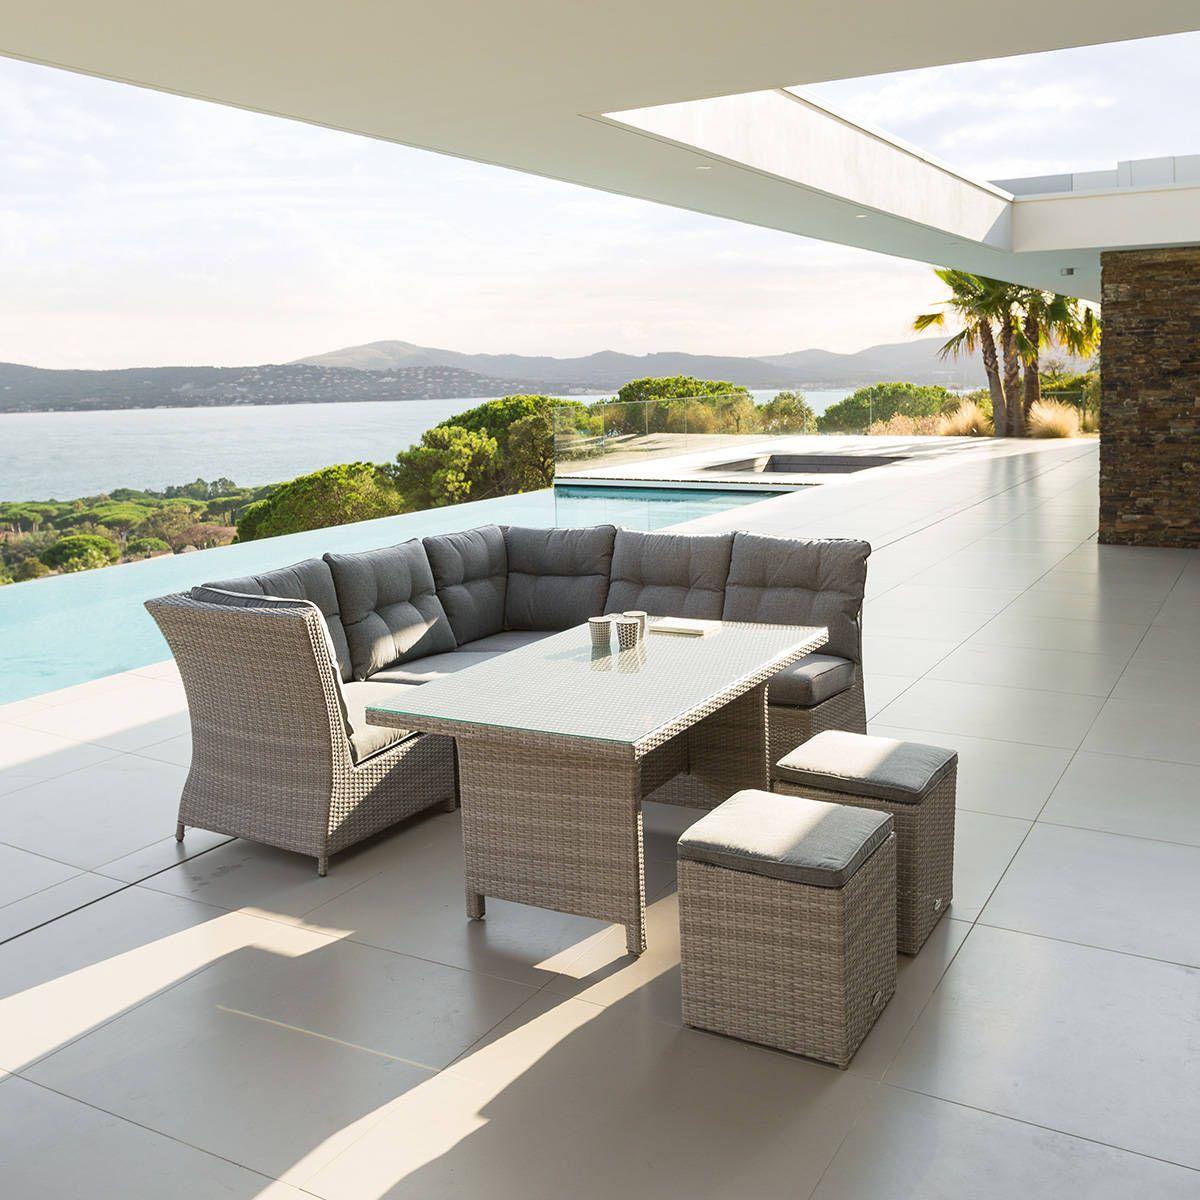 Salon d\'angle de jardin Cuba Grège | Home sweet home | Pinterest ...